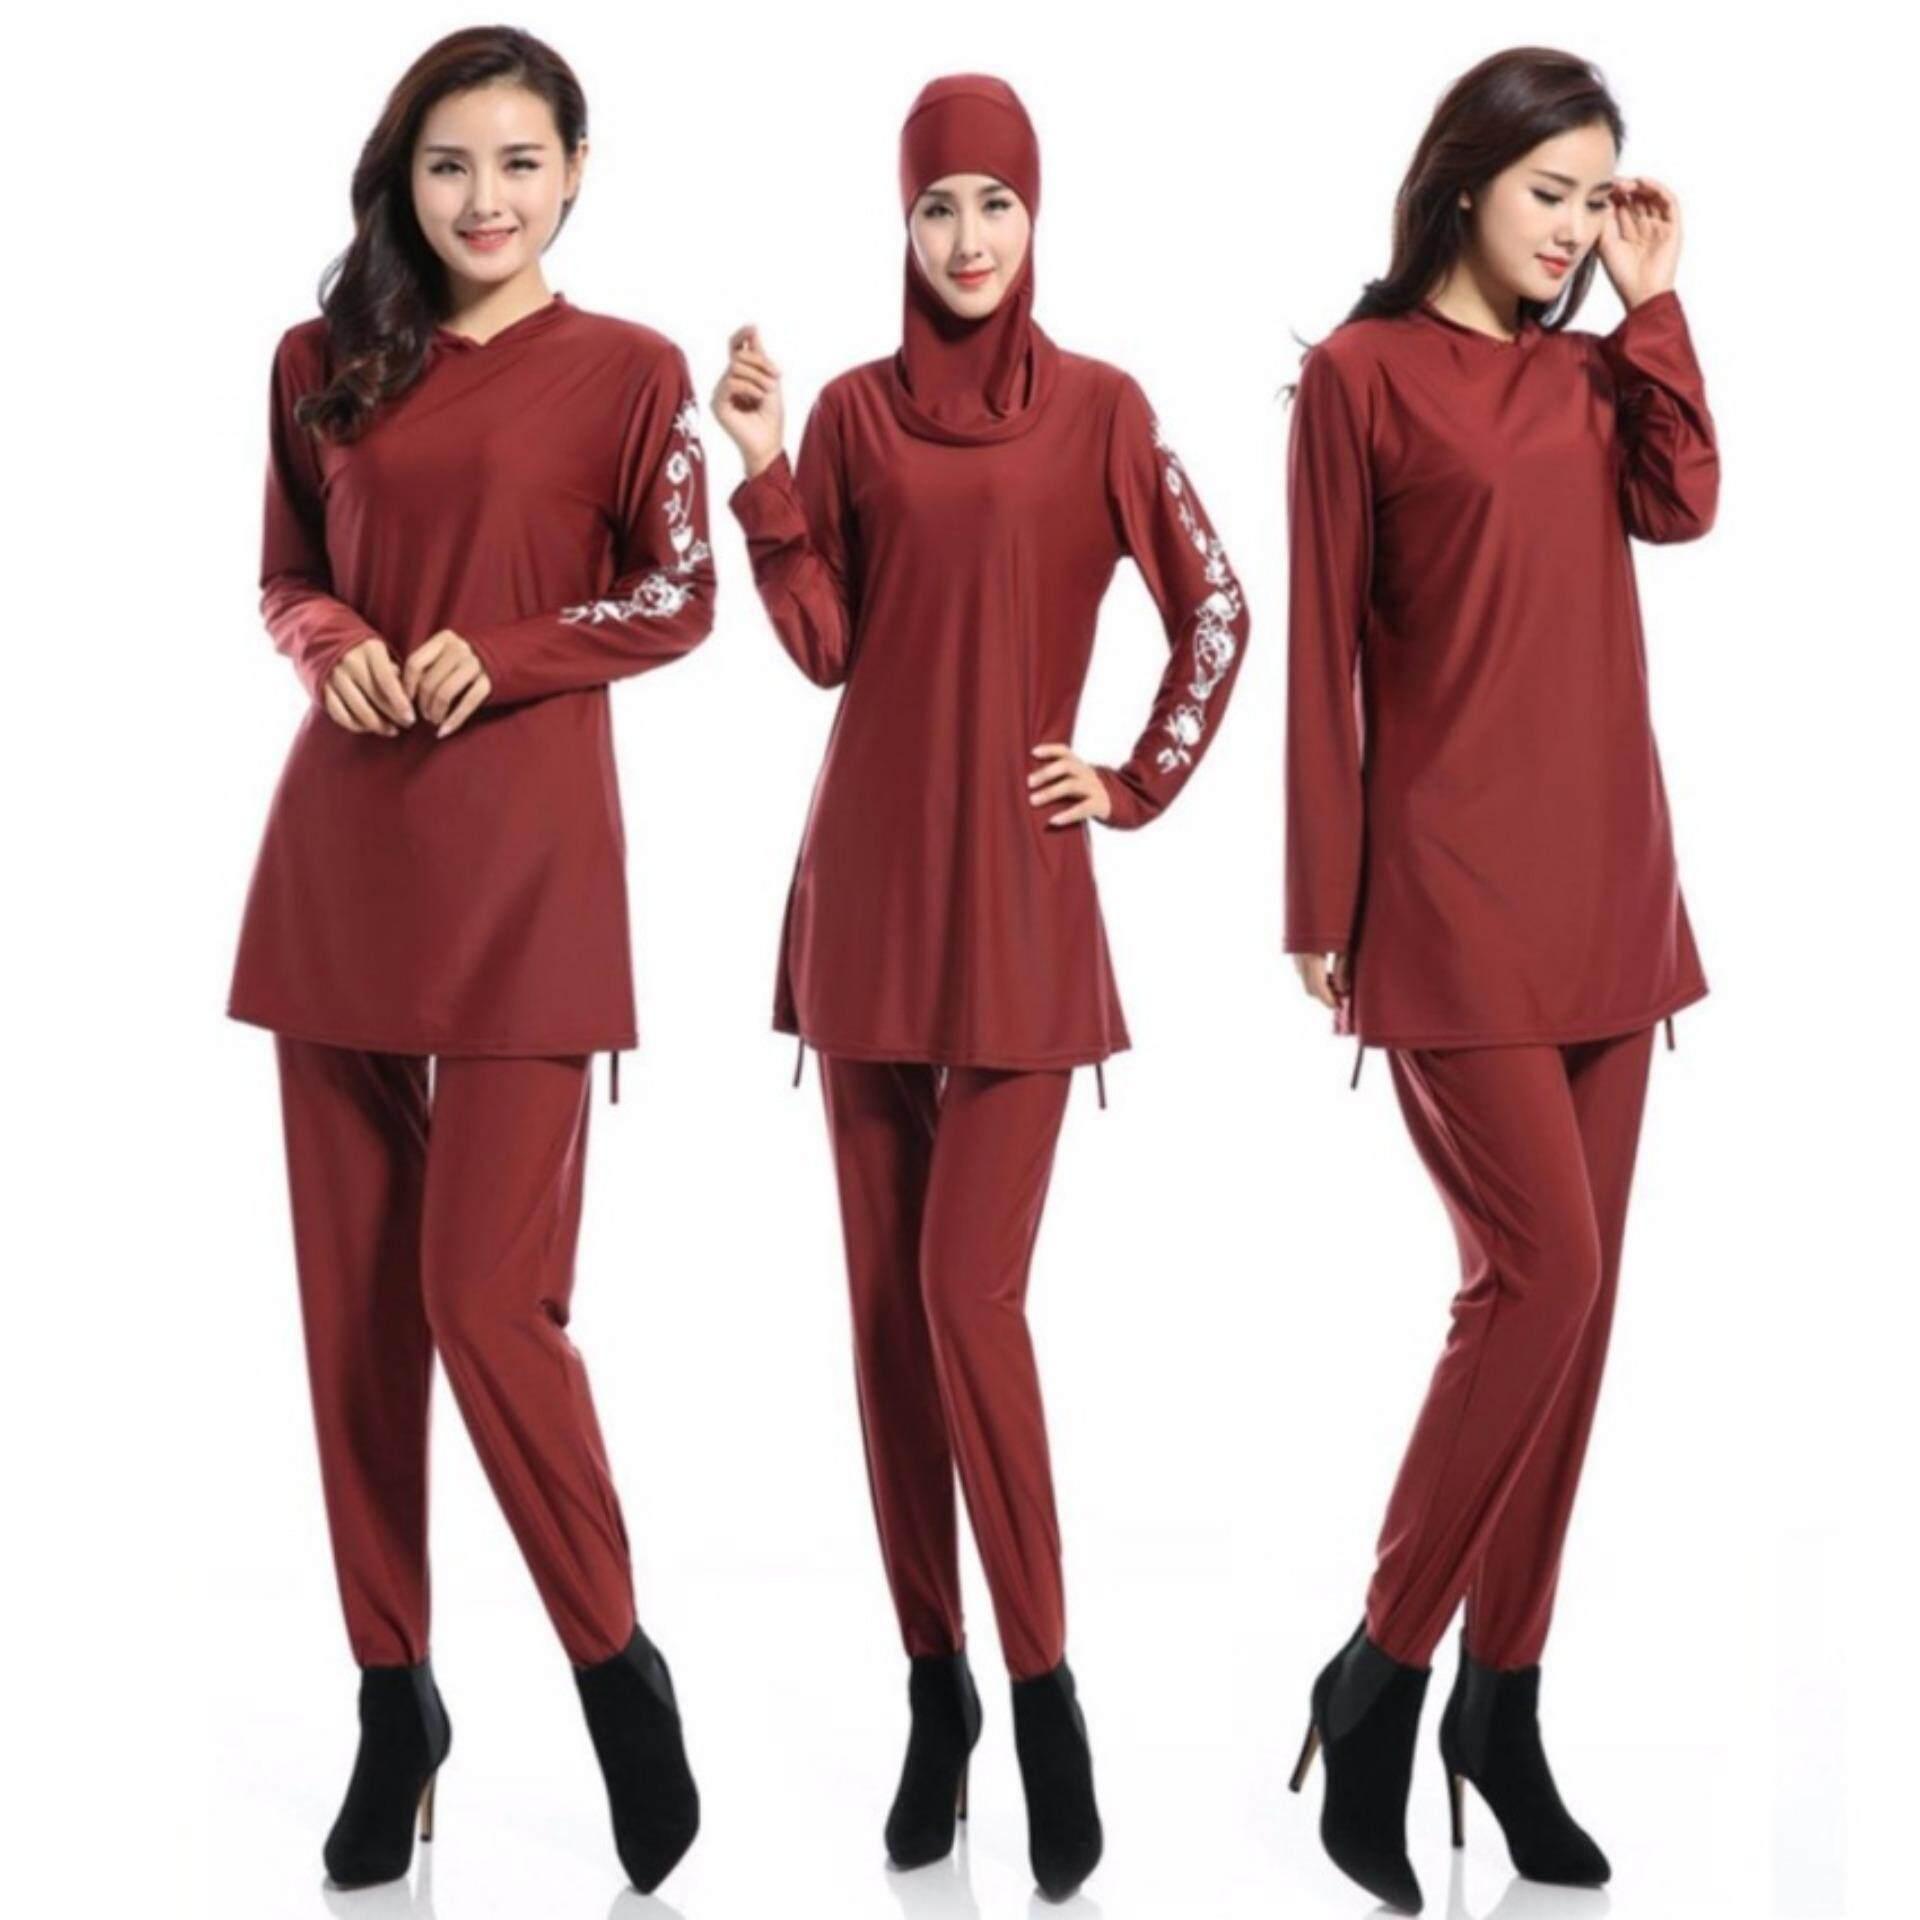 1364466e831c1 การส่งเสริม Women Plus Size Printed Floral Muslim Swimwear Fashion Muslimah  Islamic Swimsuit Swim Surf Wear Sport Clothing Red ซื้อที่ไหน - มีเพียง  ฿801.00